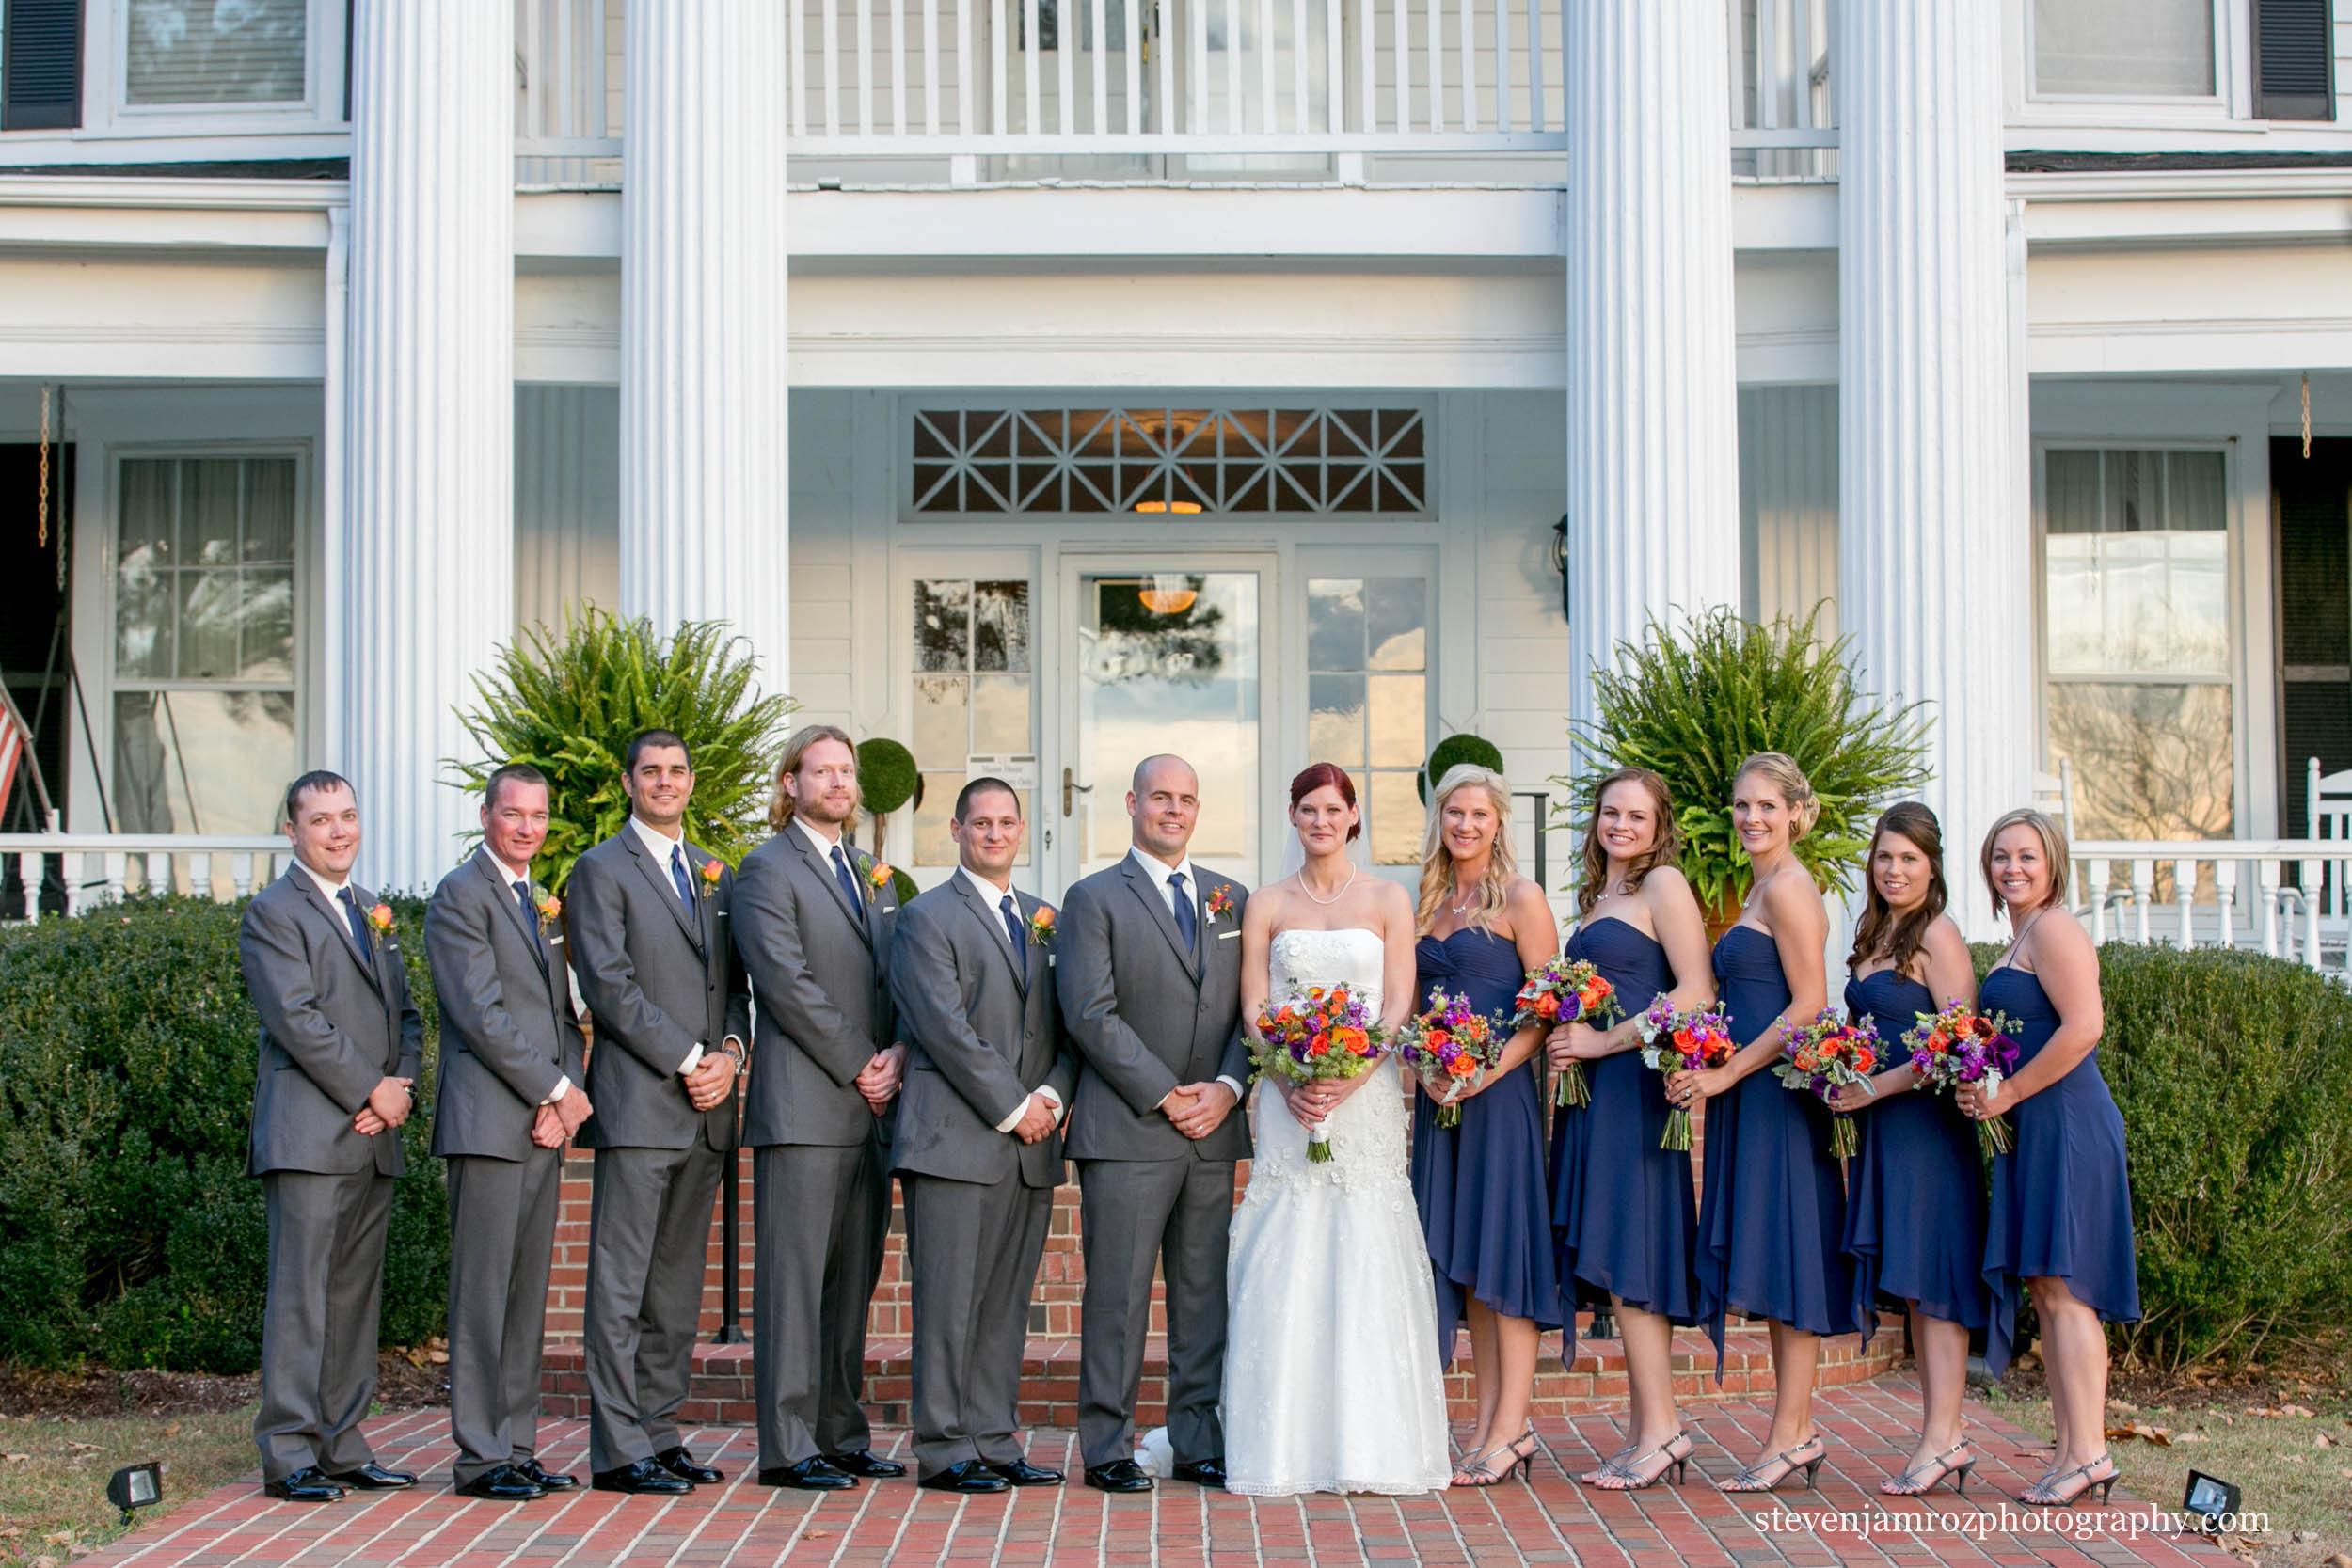 best-wedding-the-hudson-manor-photographer-steven-jamroz-0671.jpg